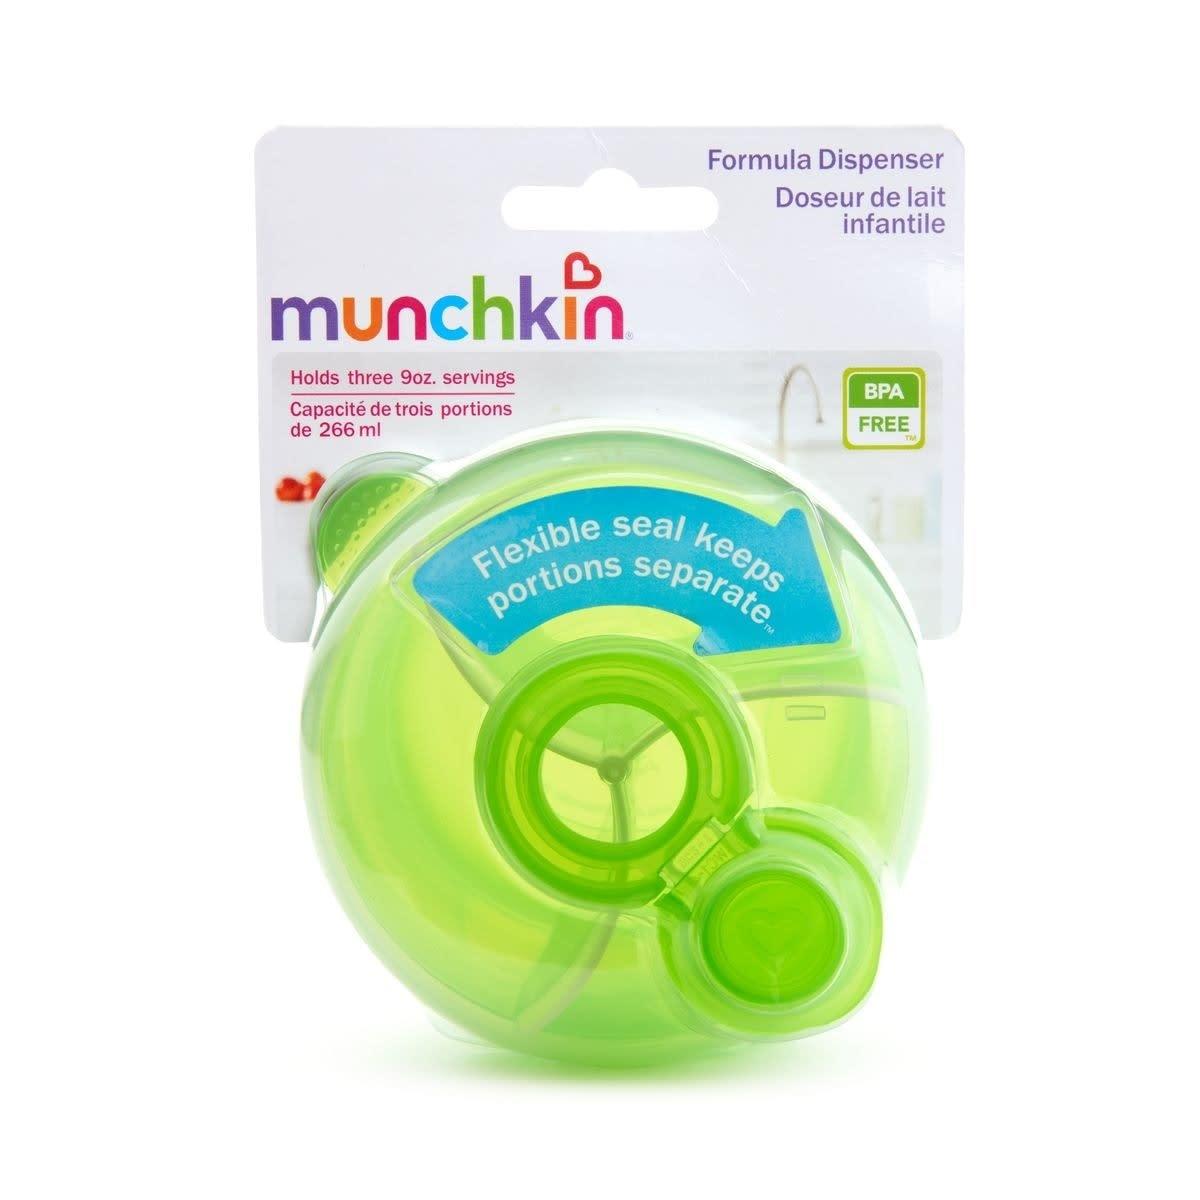 Munchkins Munchkin Formula Dispenser